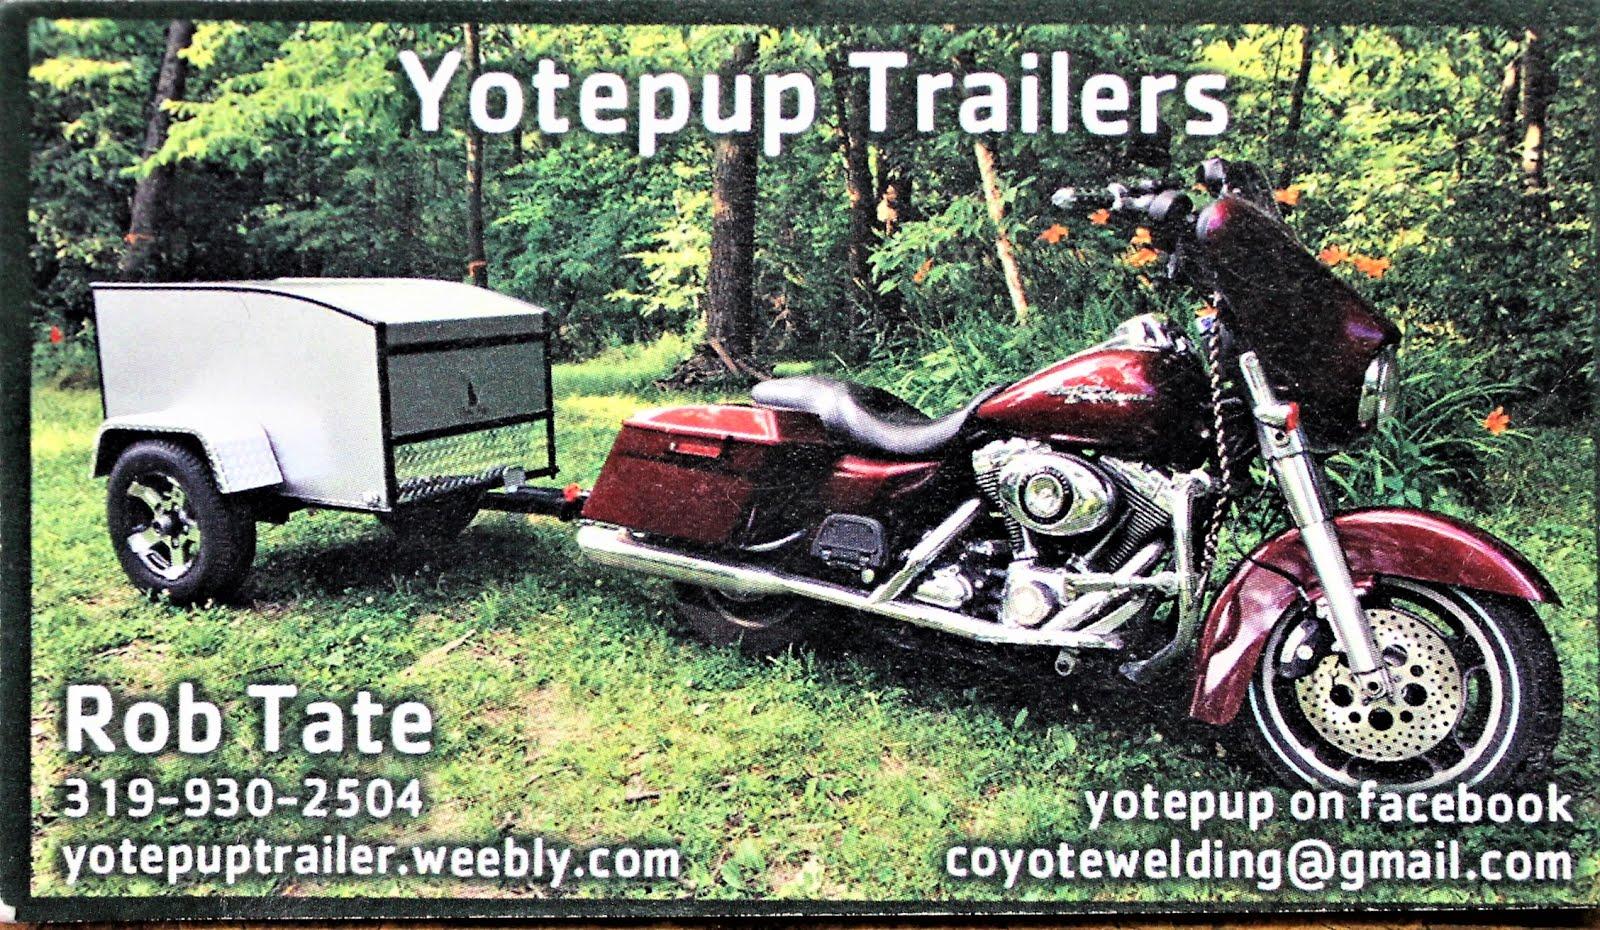 Yotepup Trailers